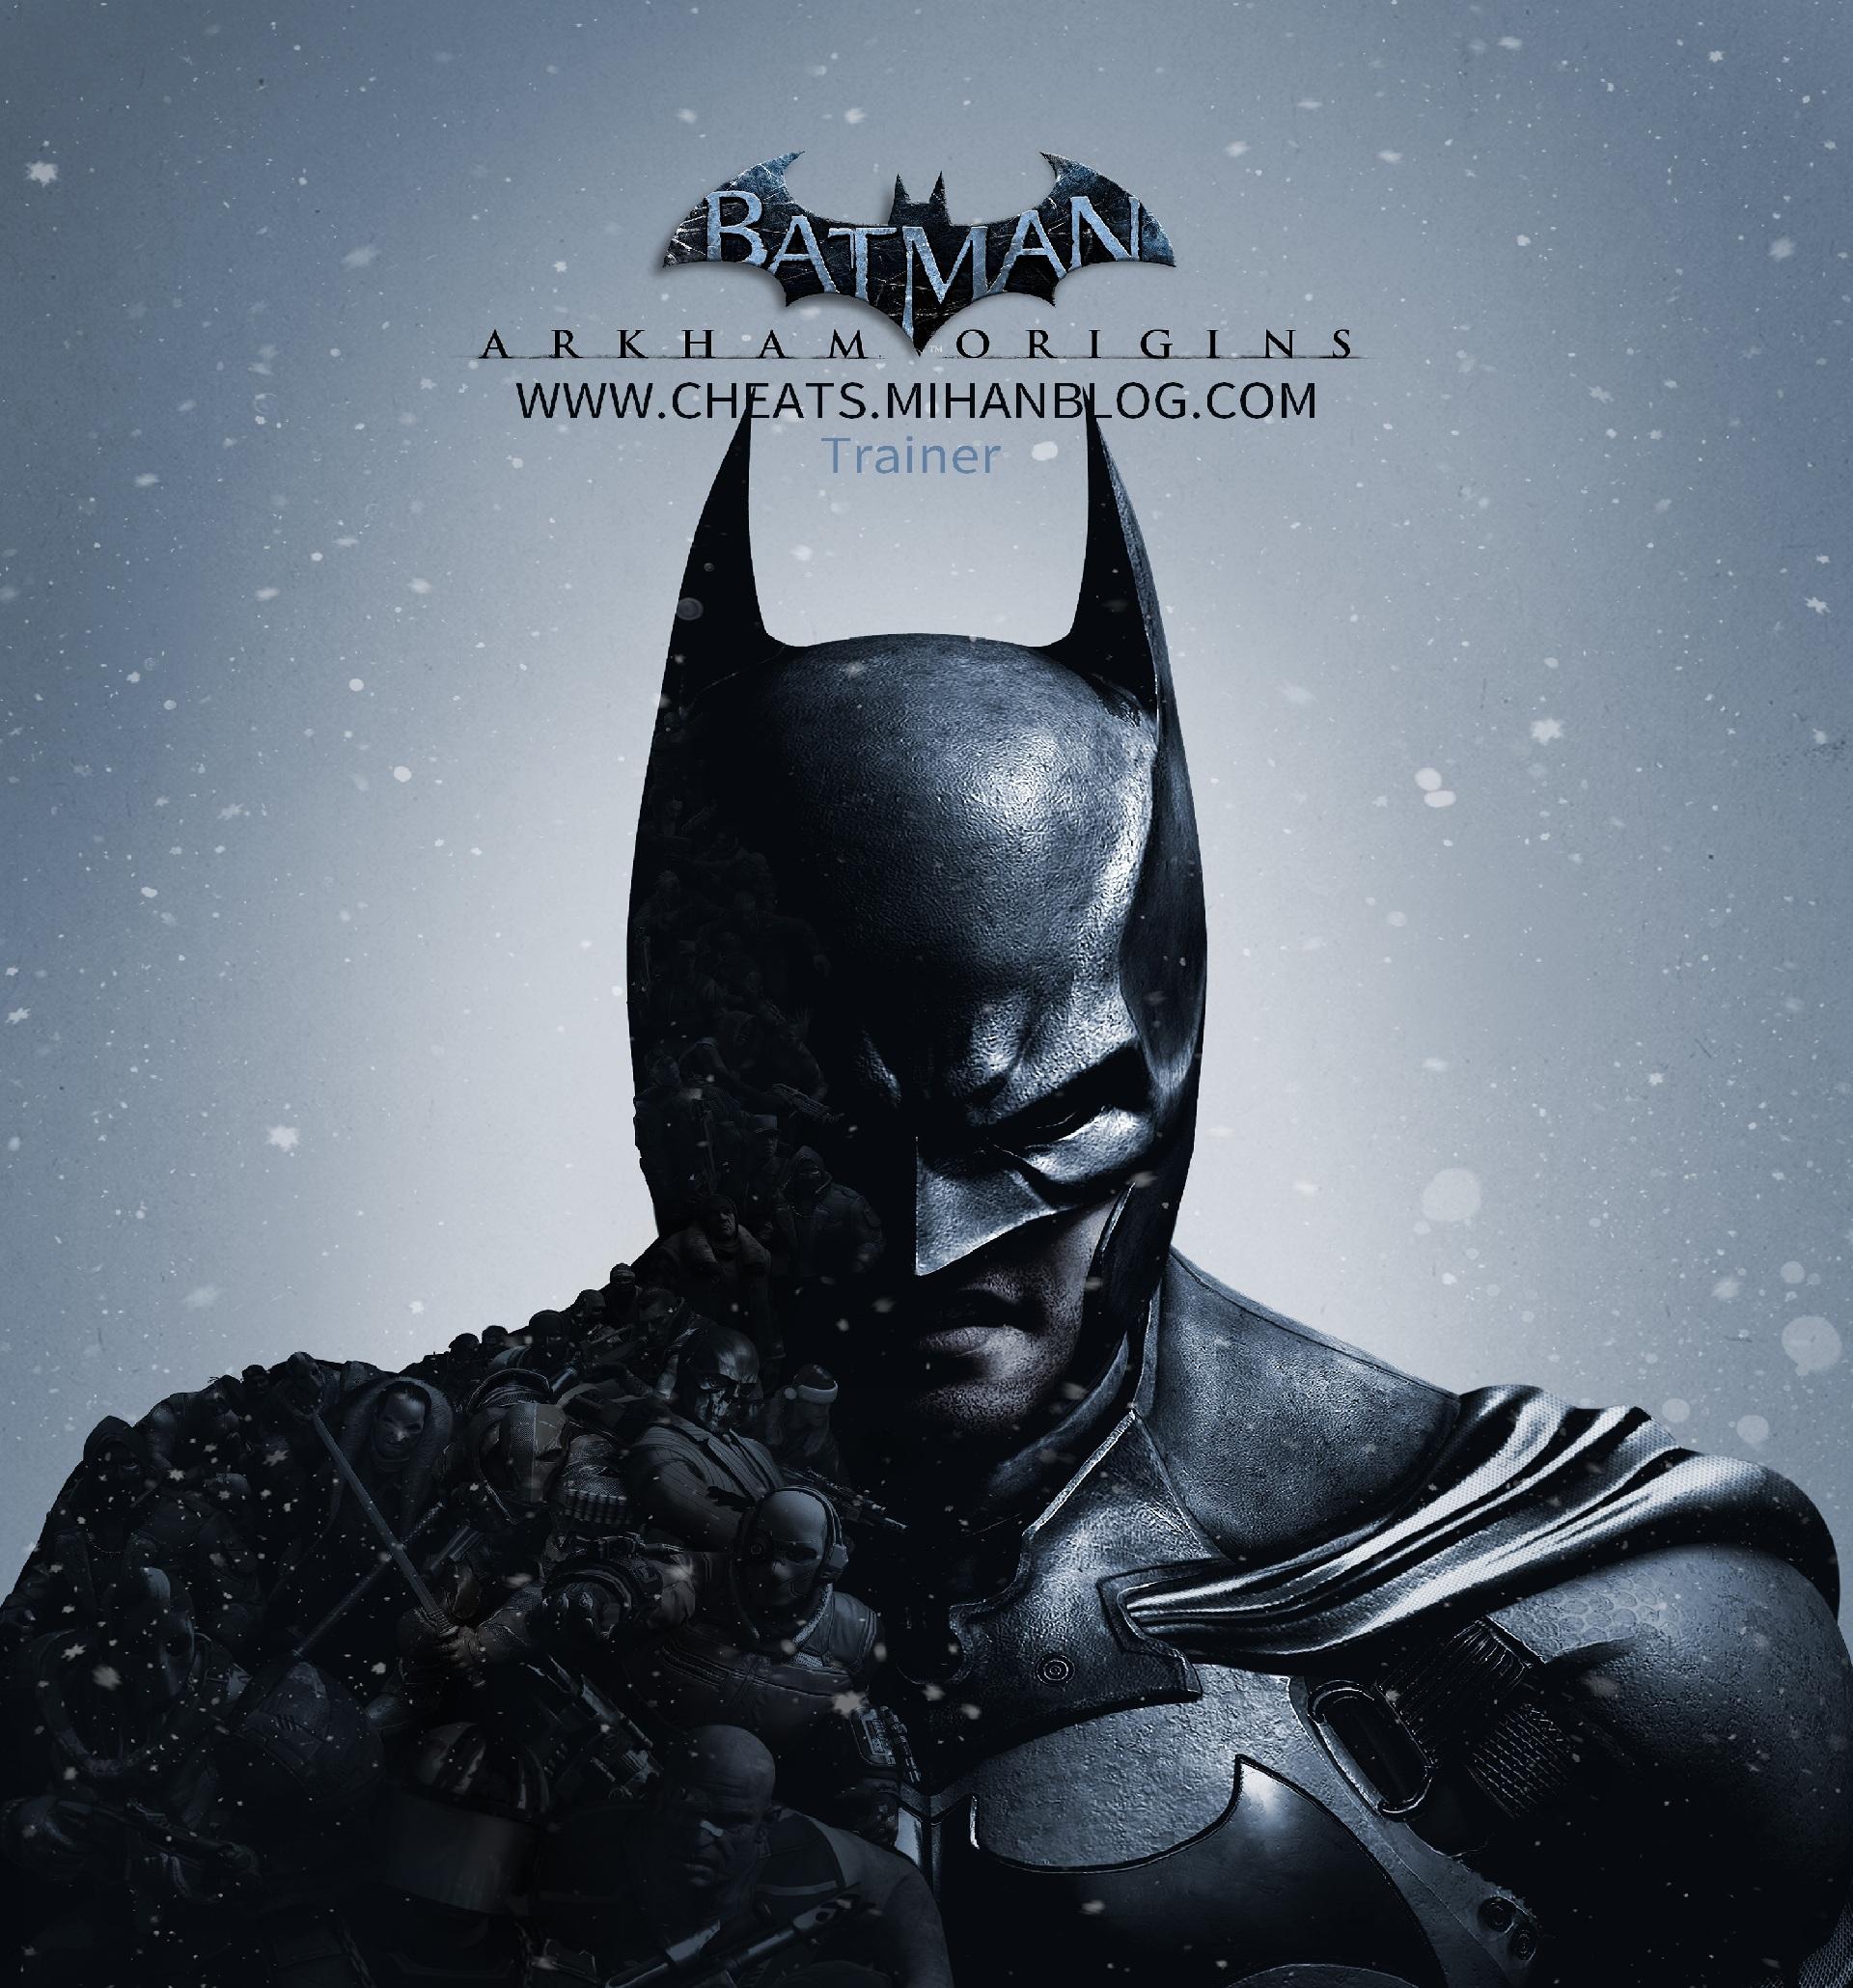 http://s5.picofile.com/file/8114274018/Batman_ArkhamOrigins1_Copy.jpg